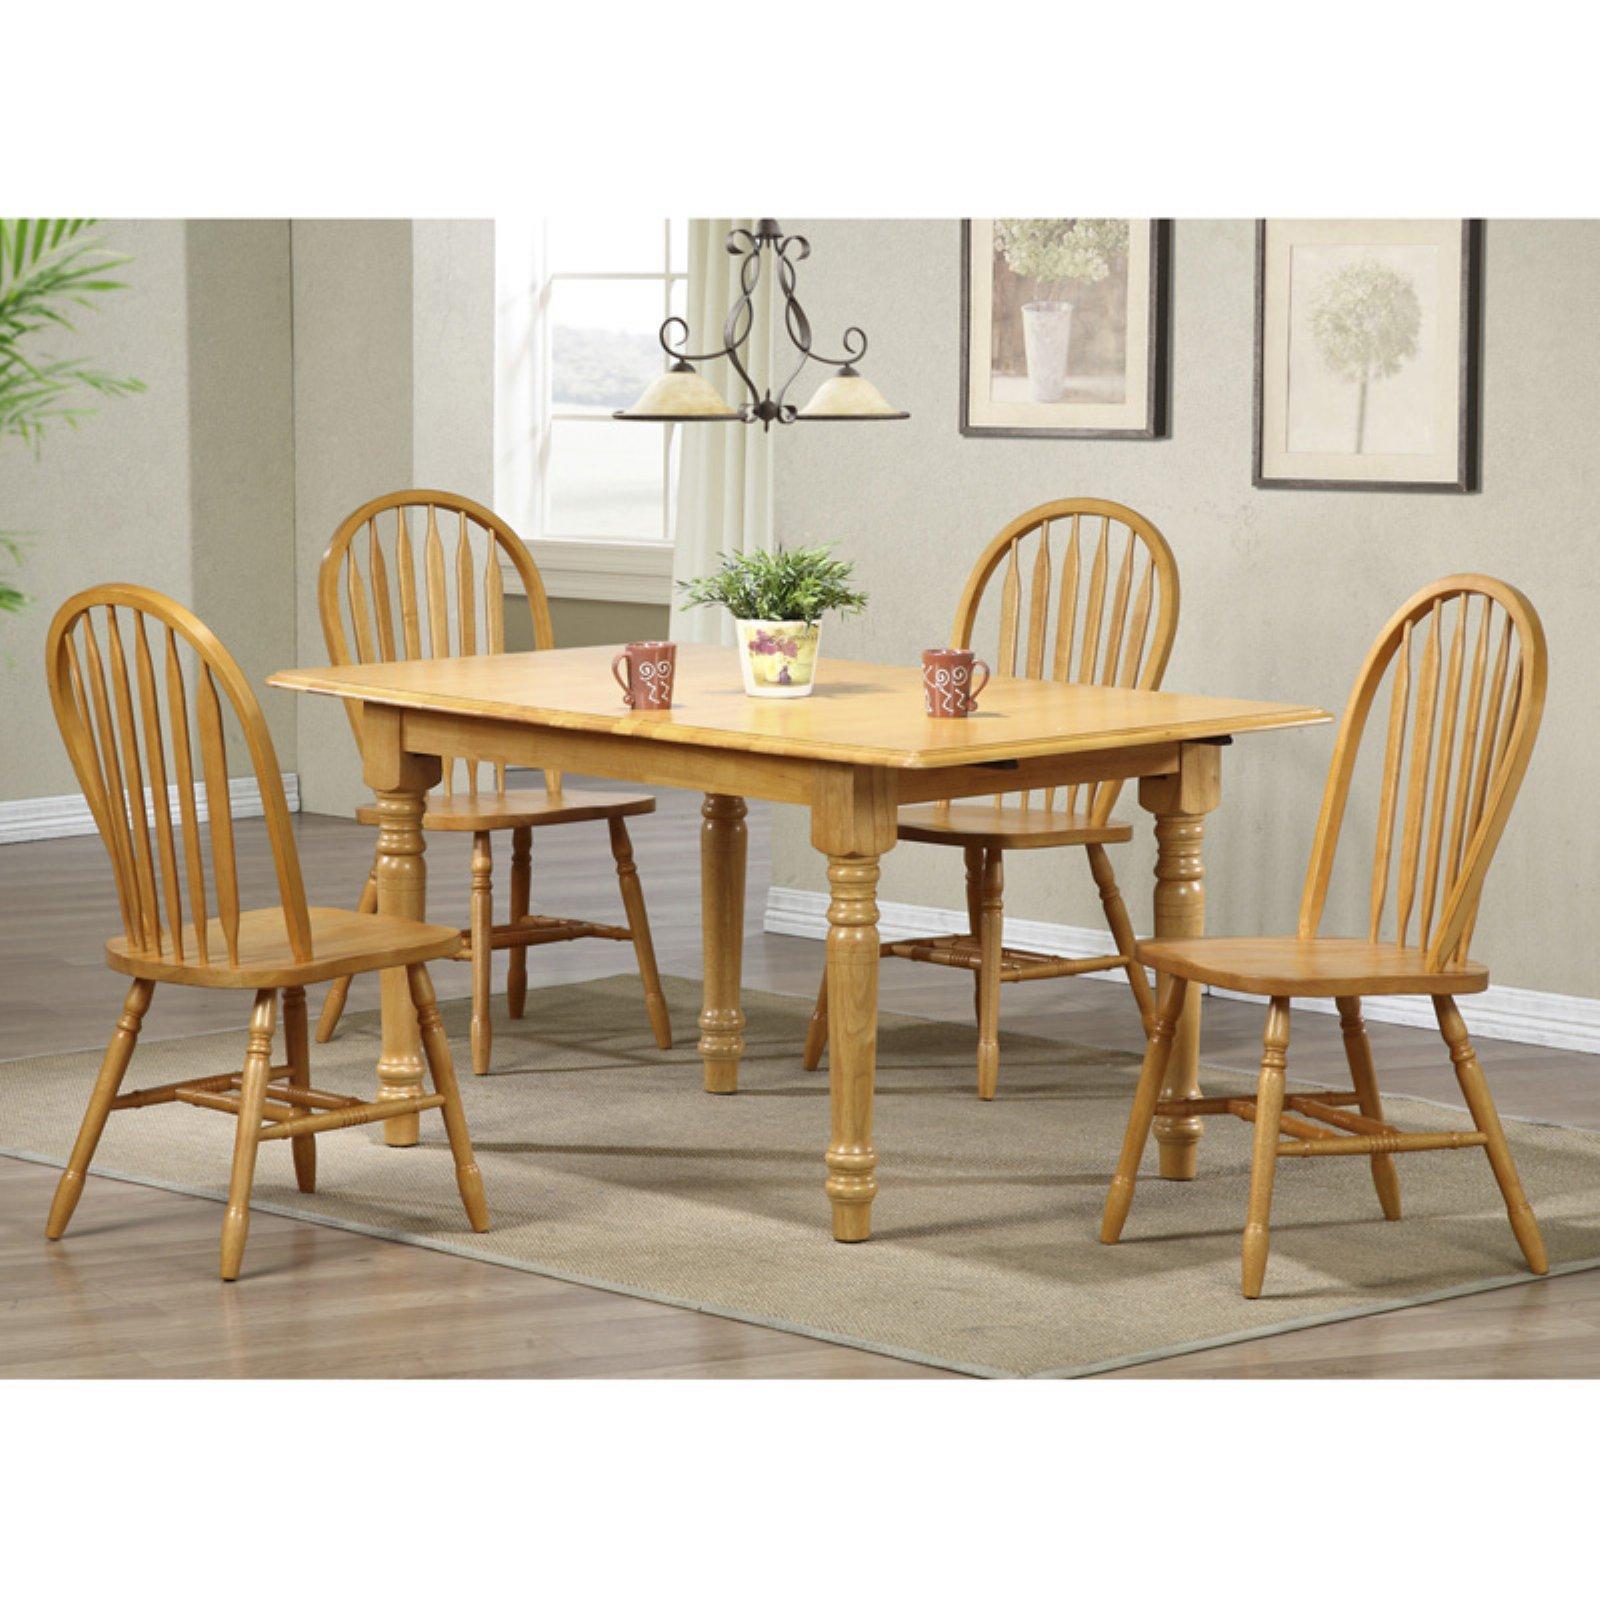 sunset trading 5 piece pedestal extension dining set with arrowback rh pinterest com